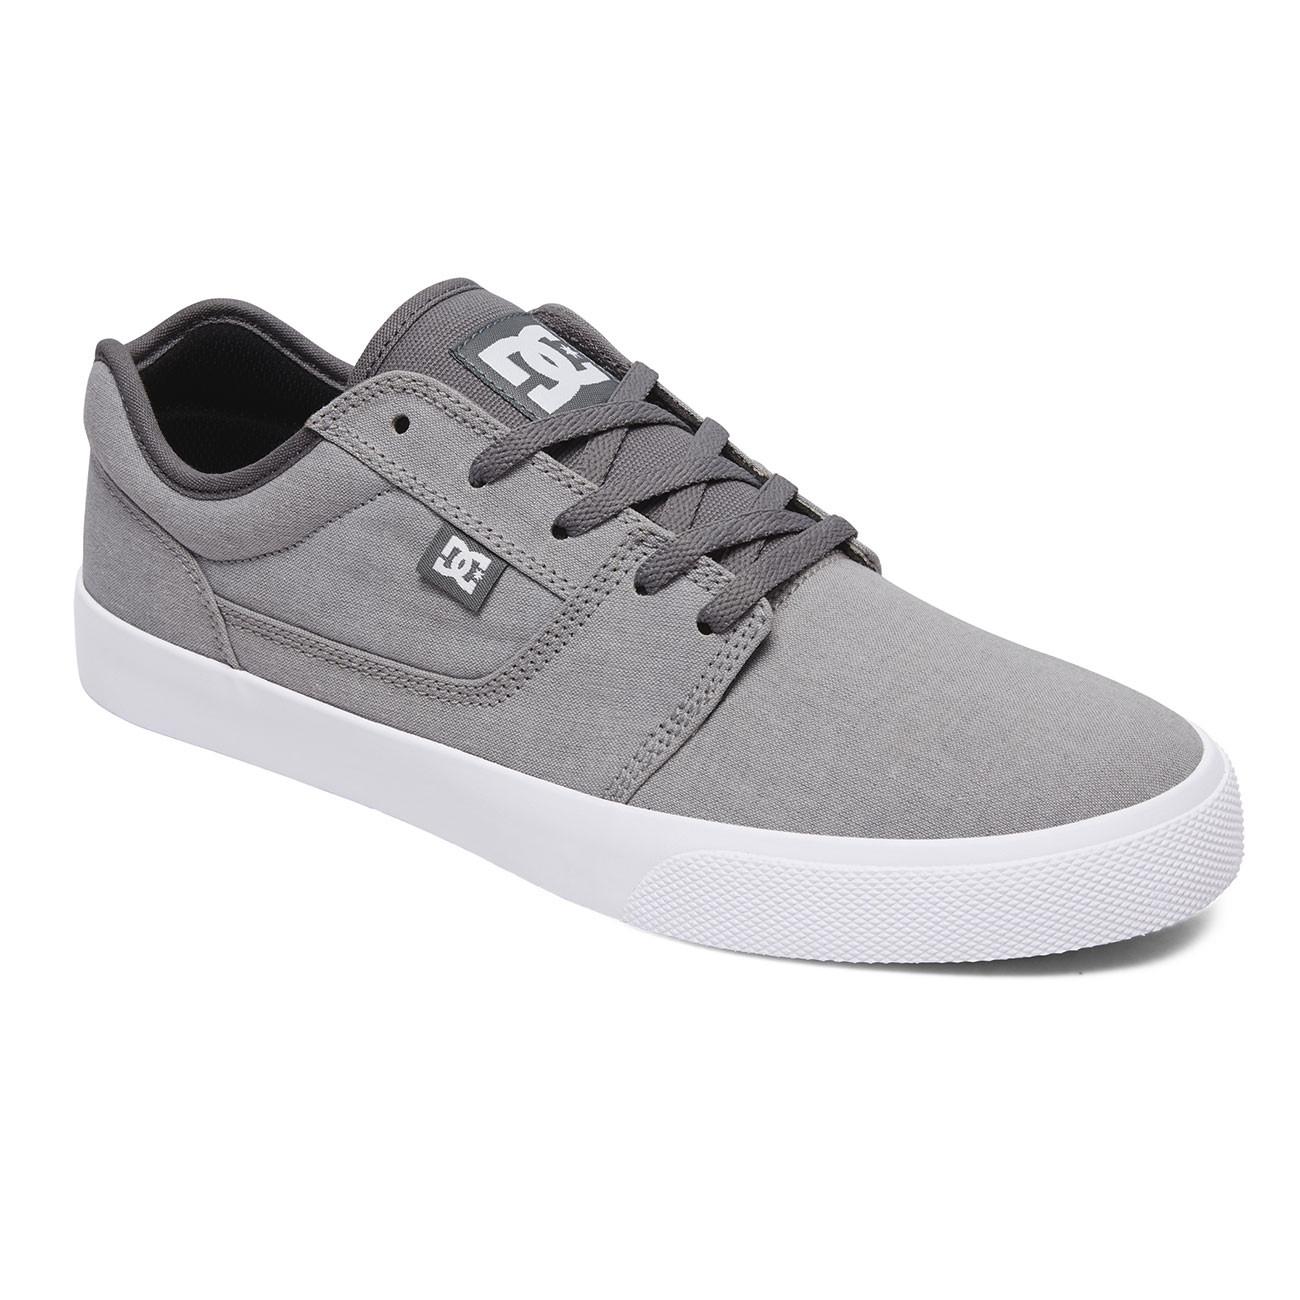 Sneakers DC Tonik TX SE dark shadow